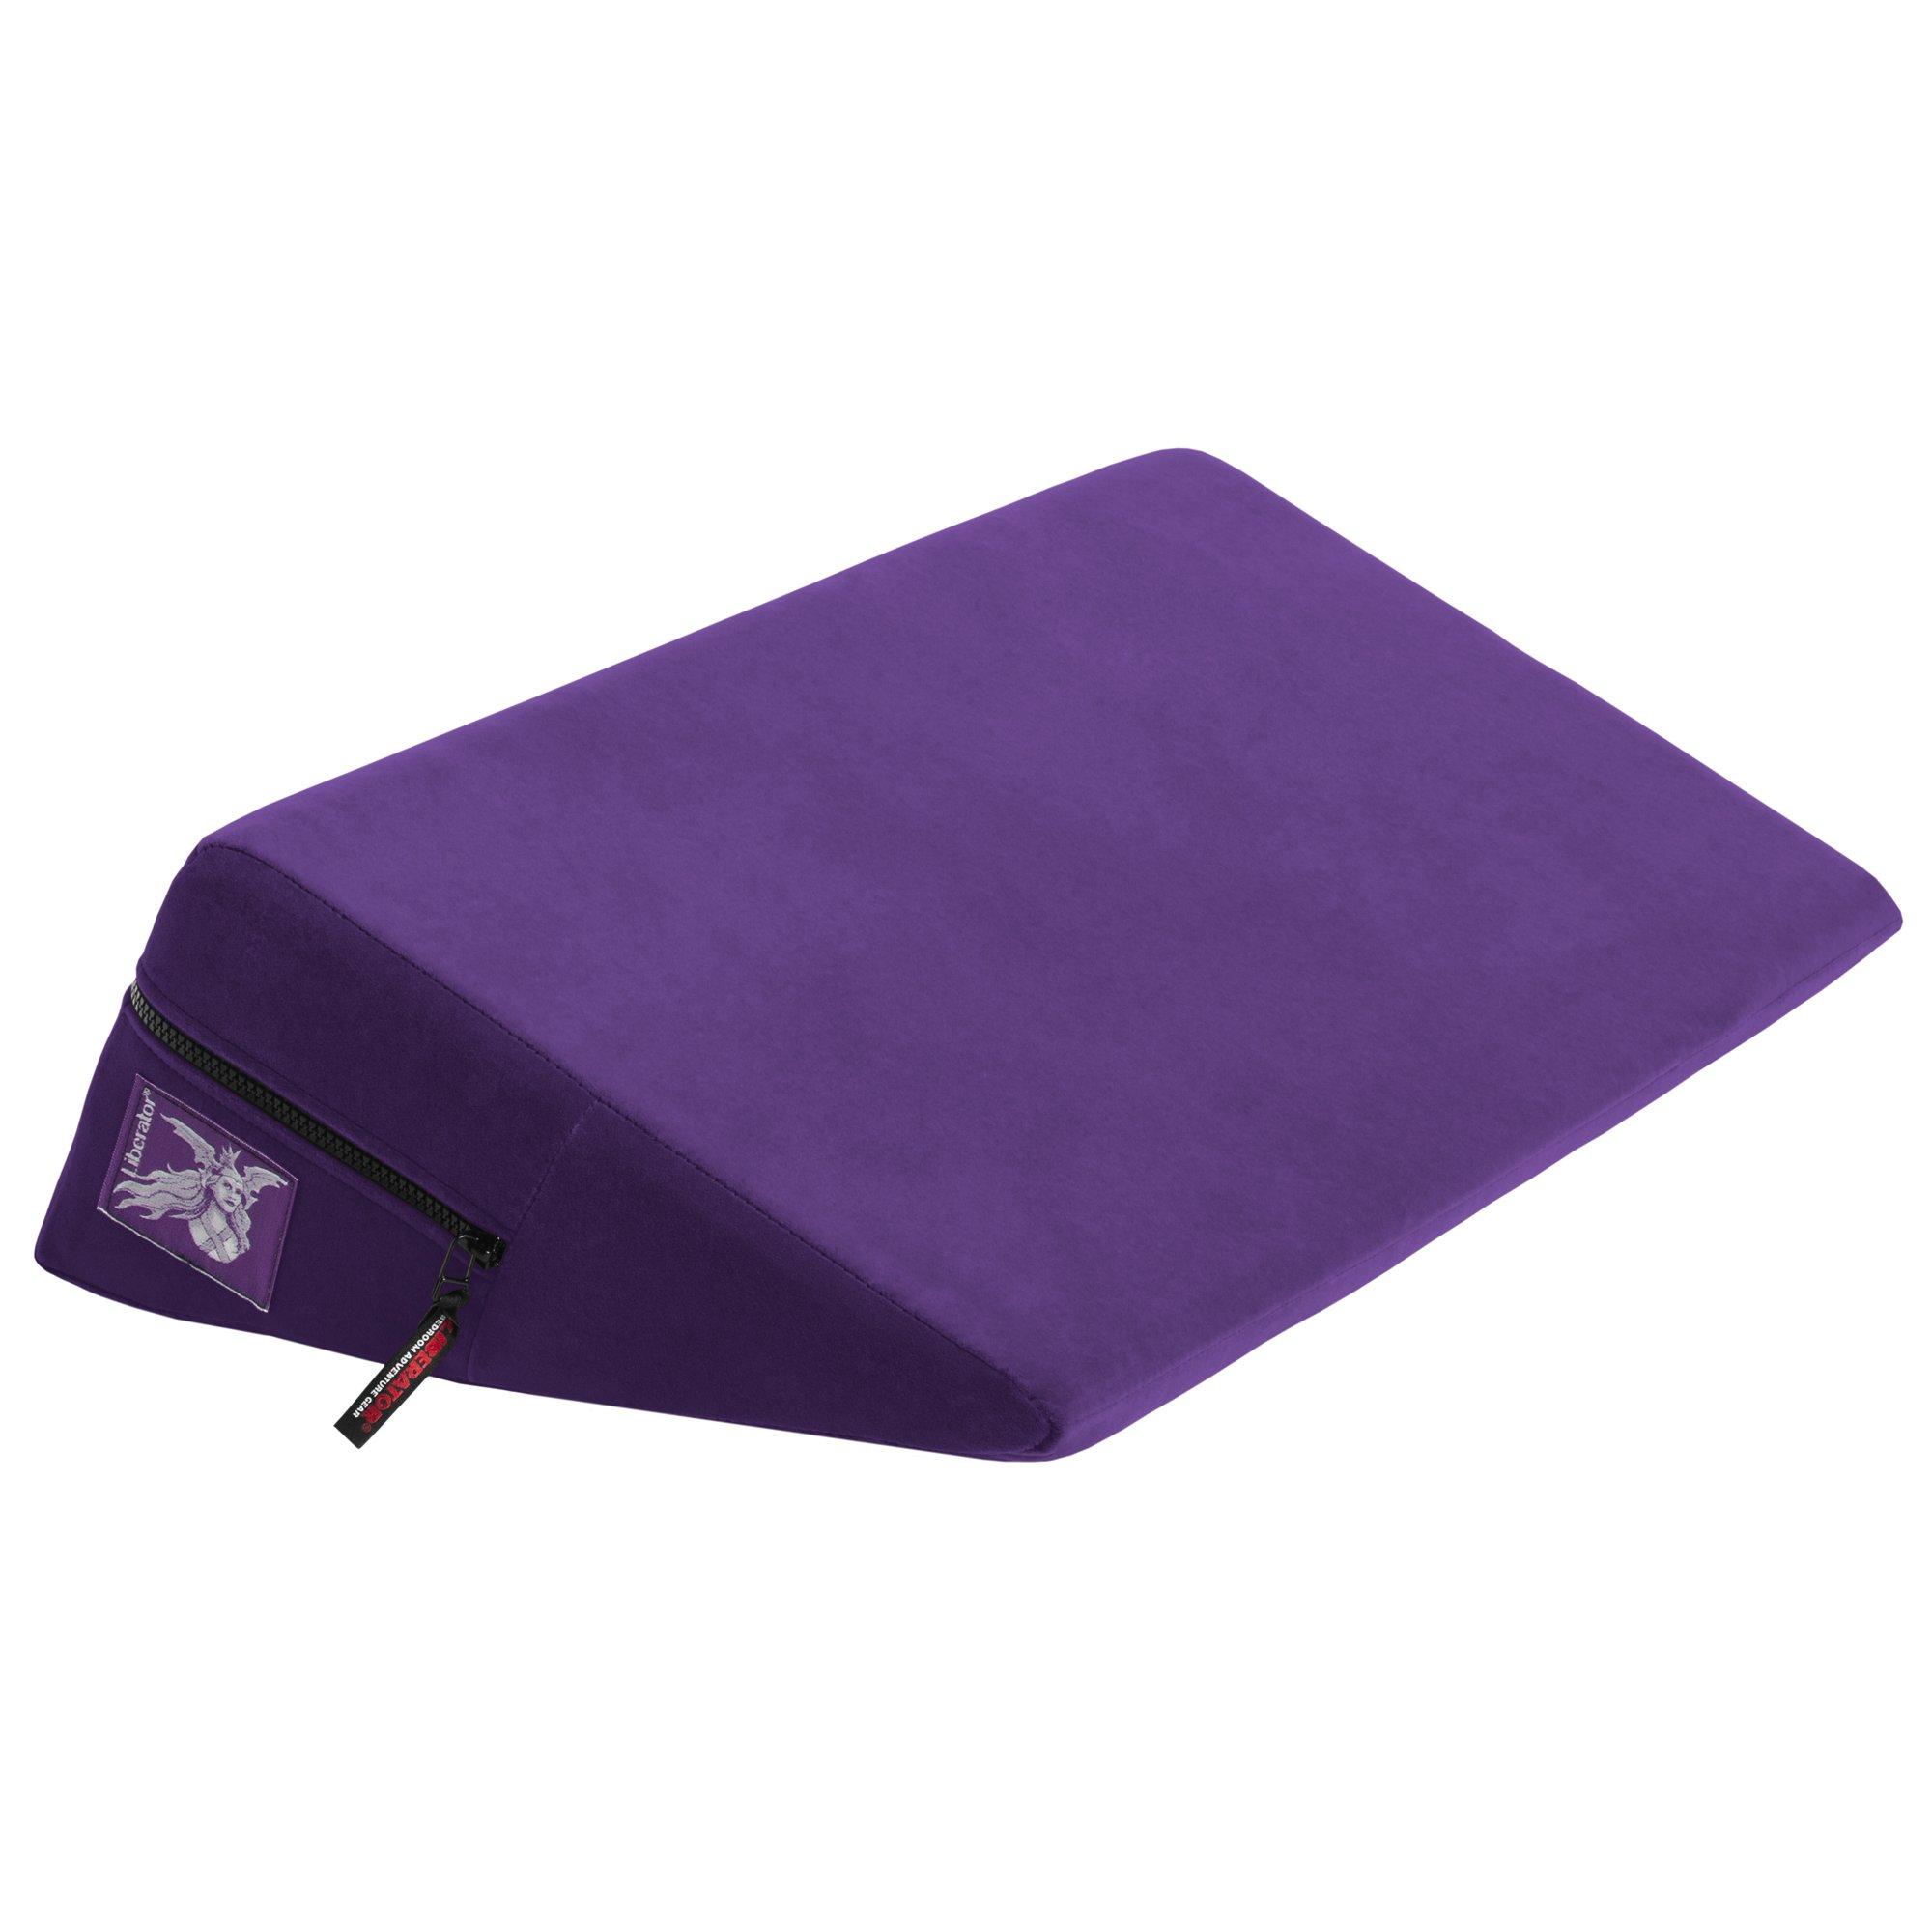 Wedge Plus Size, Purple Microfiber